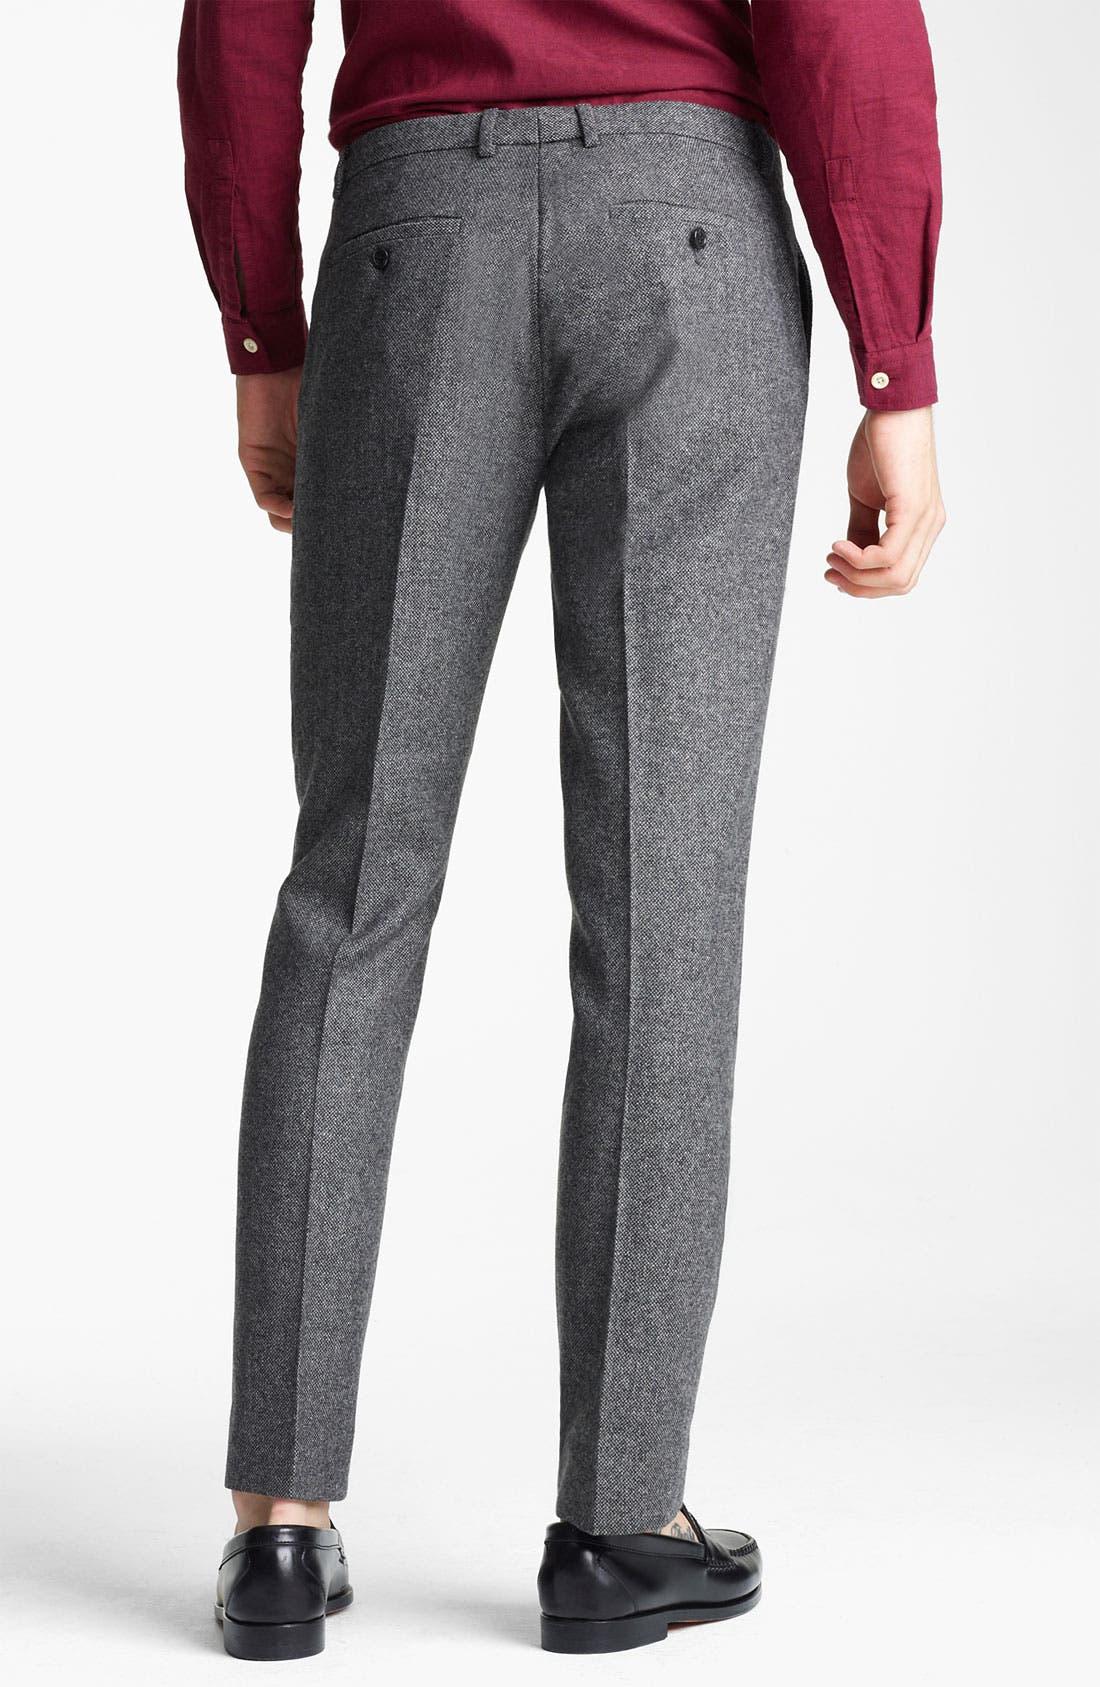 TOPMAN, 'Vento' Tweed Skinny Trousers, Alternate thumbnail 3, color, 020